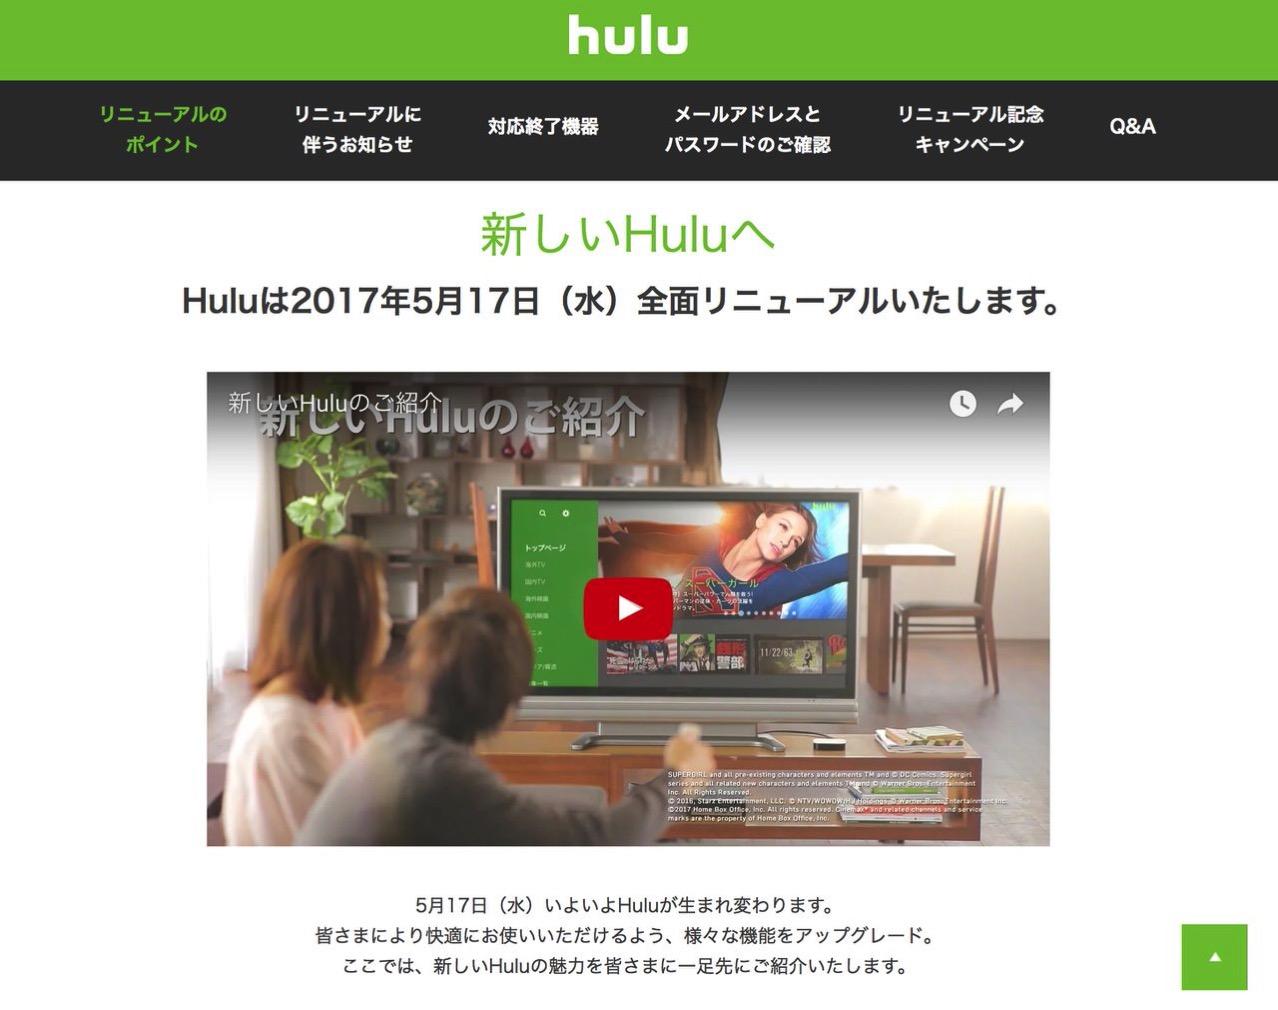 「Hulu」リニューアルでURLを happyon.jp に変更と発表